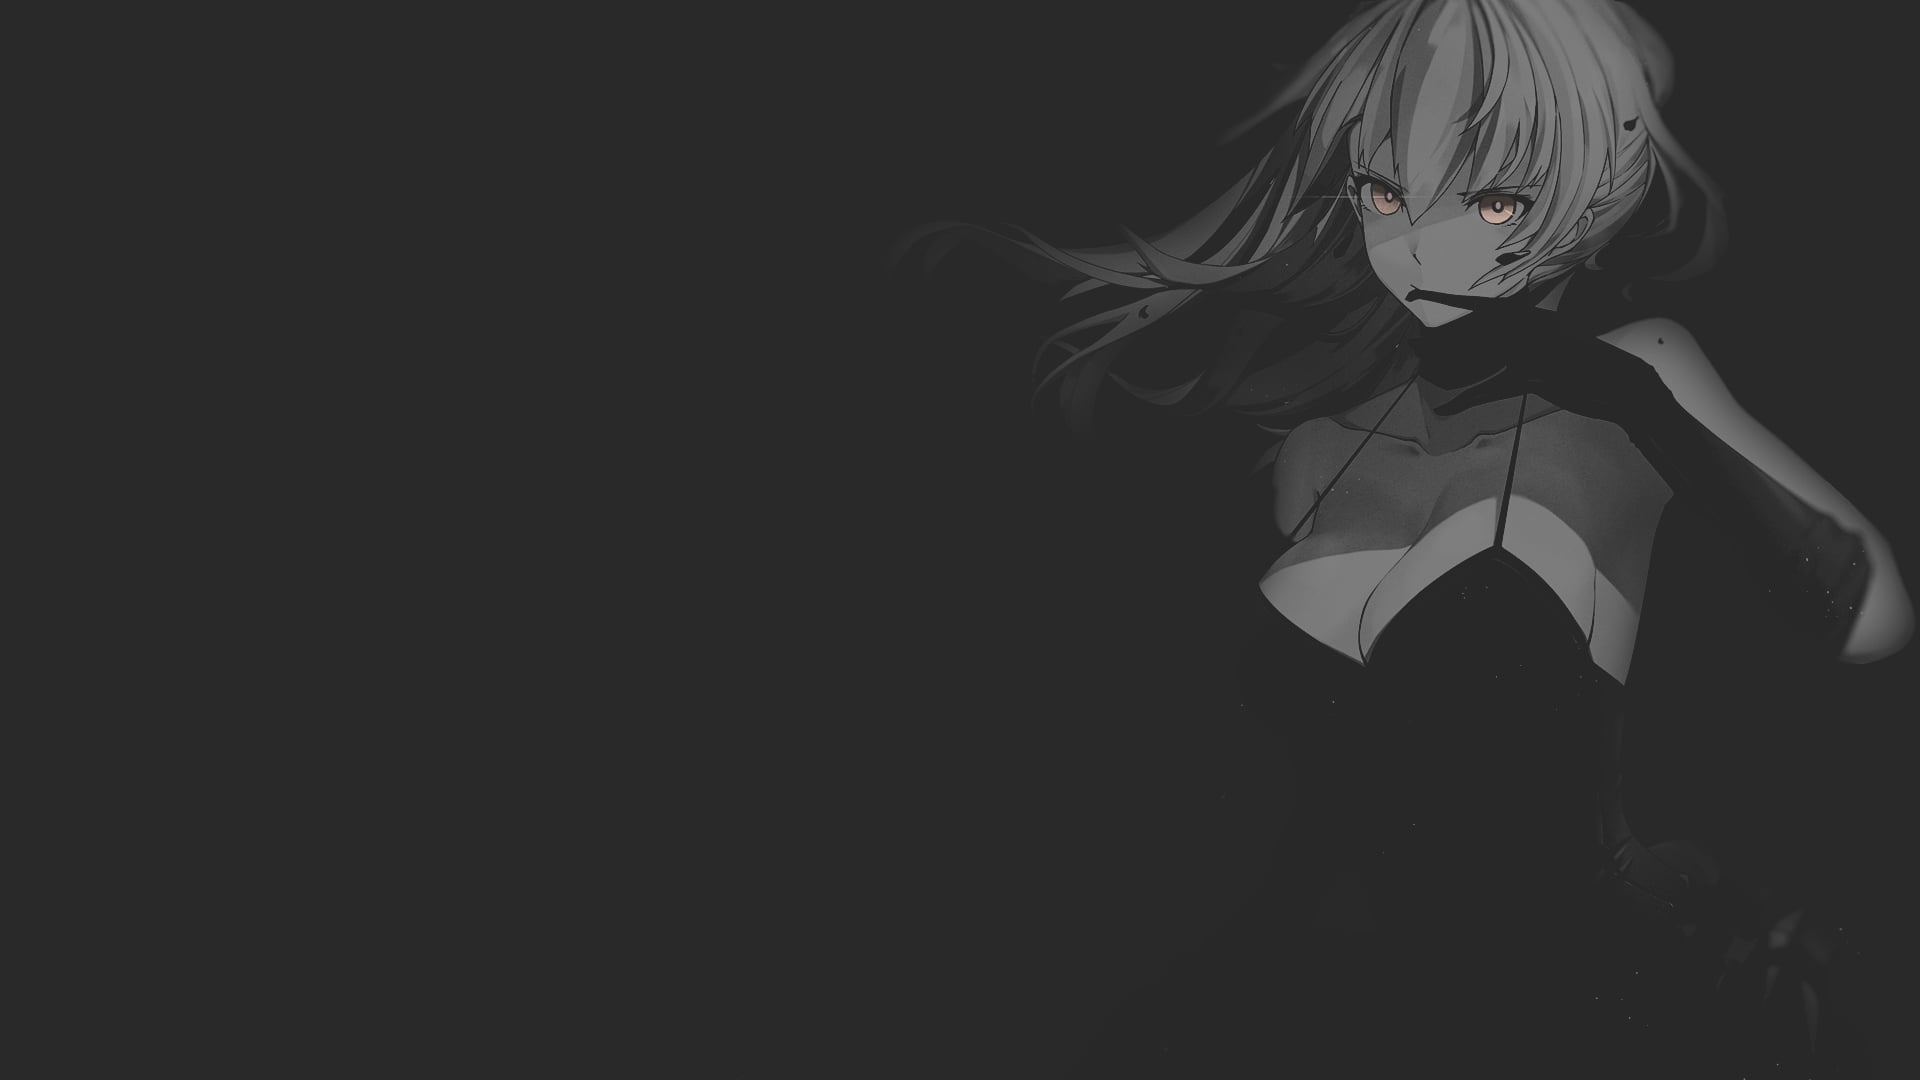 Dark Wallpaper Wallpaper Fate Stay Night Anime Illustration Minimalism Texture Black Background Wallpaper For You The Best Wallpaper For Desktop Mobile